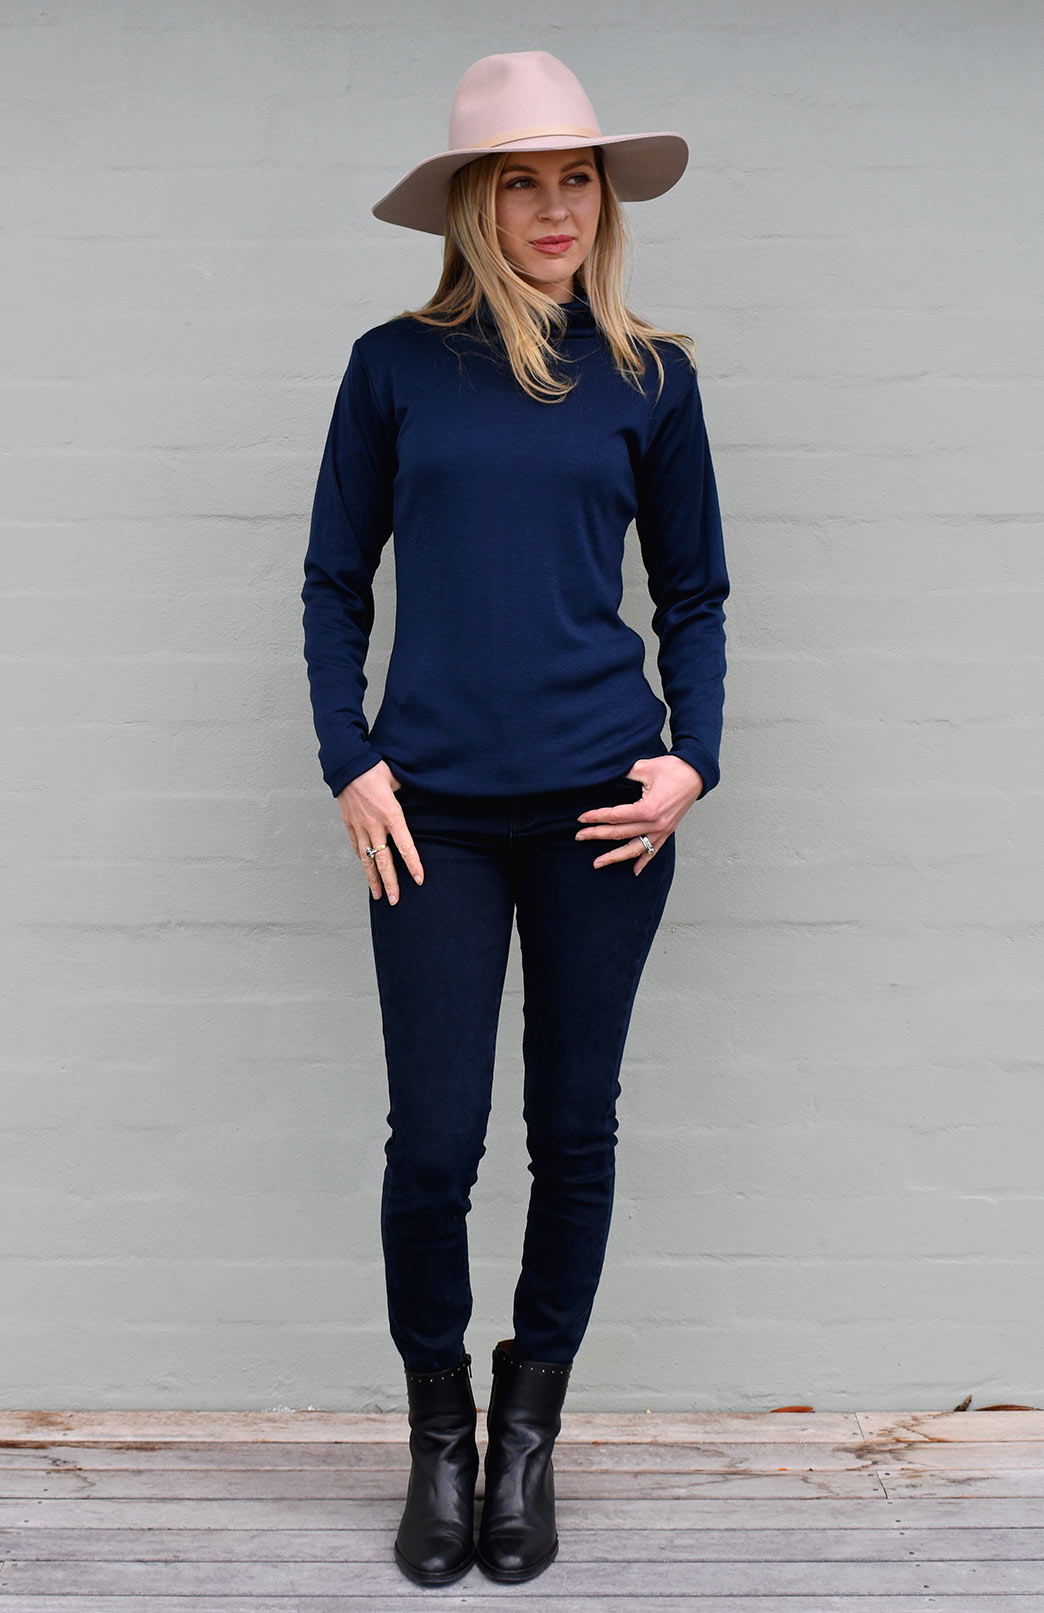 Polo Neck Top - Women's Indigo Blue Wool Long Sleeved Polo Neck Top - Smitten Merino Tasmania Australia